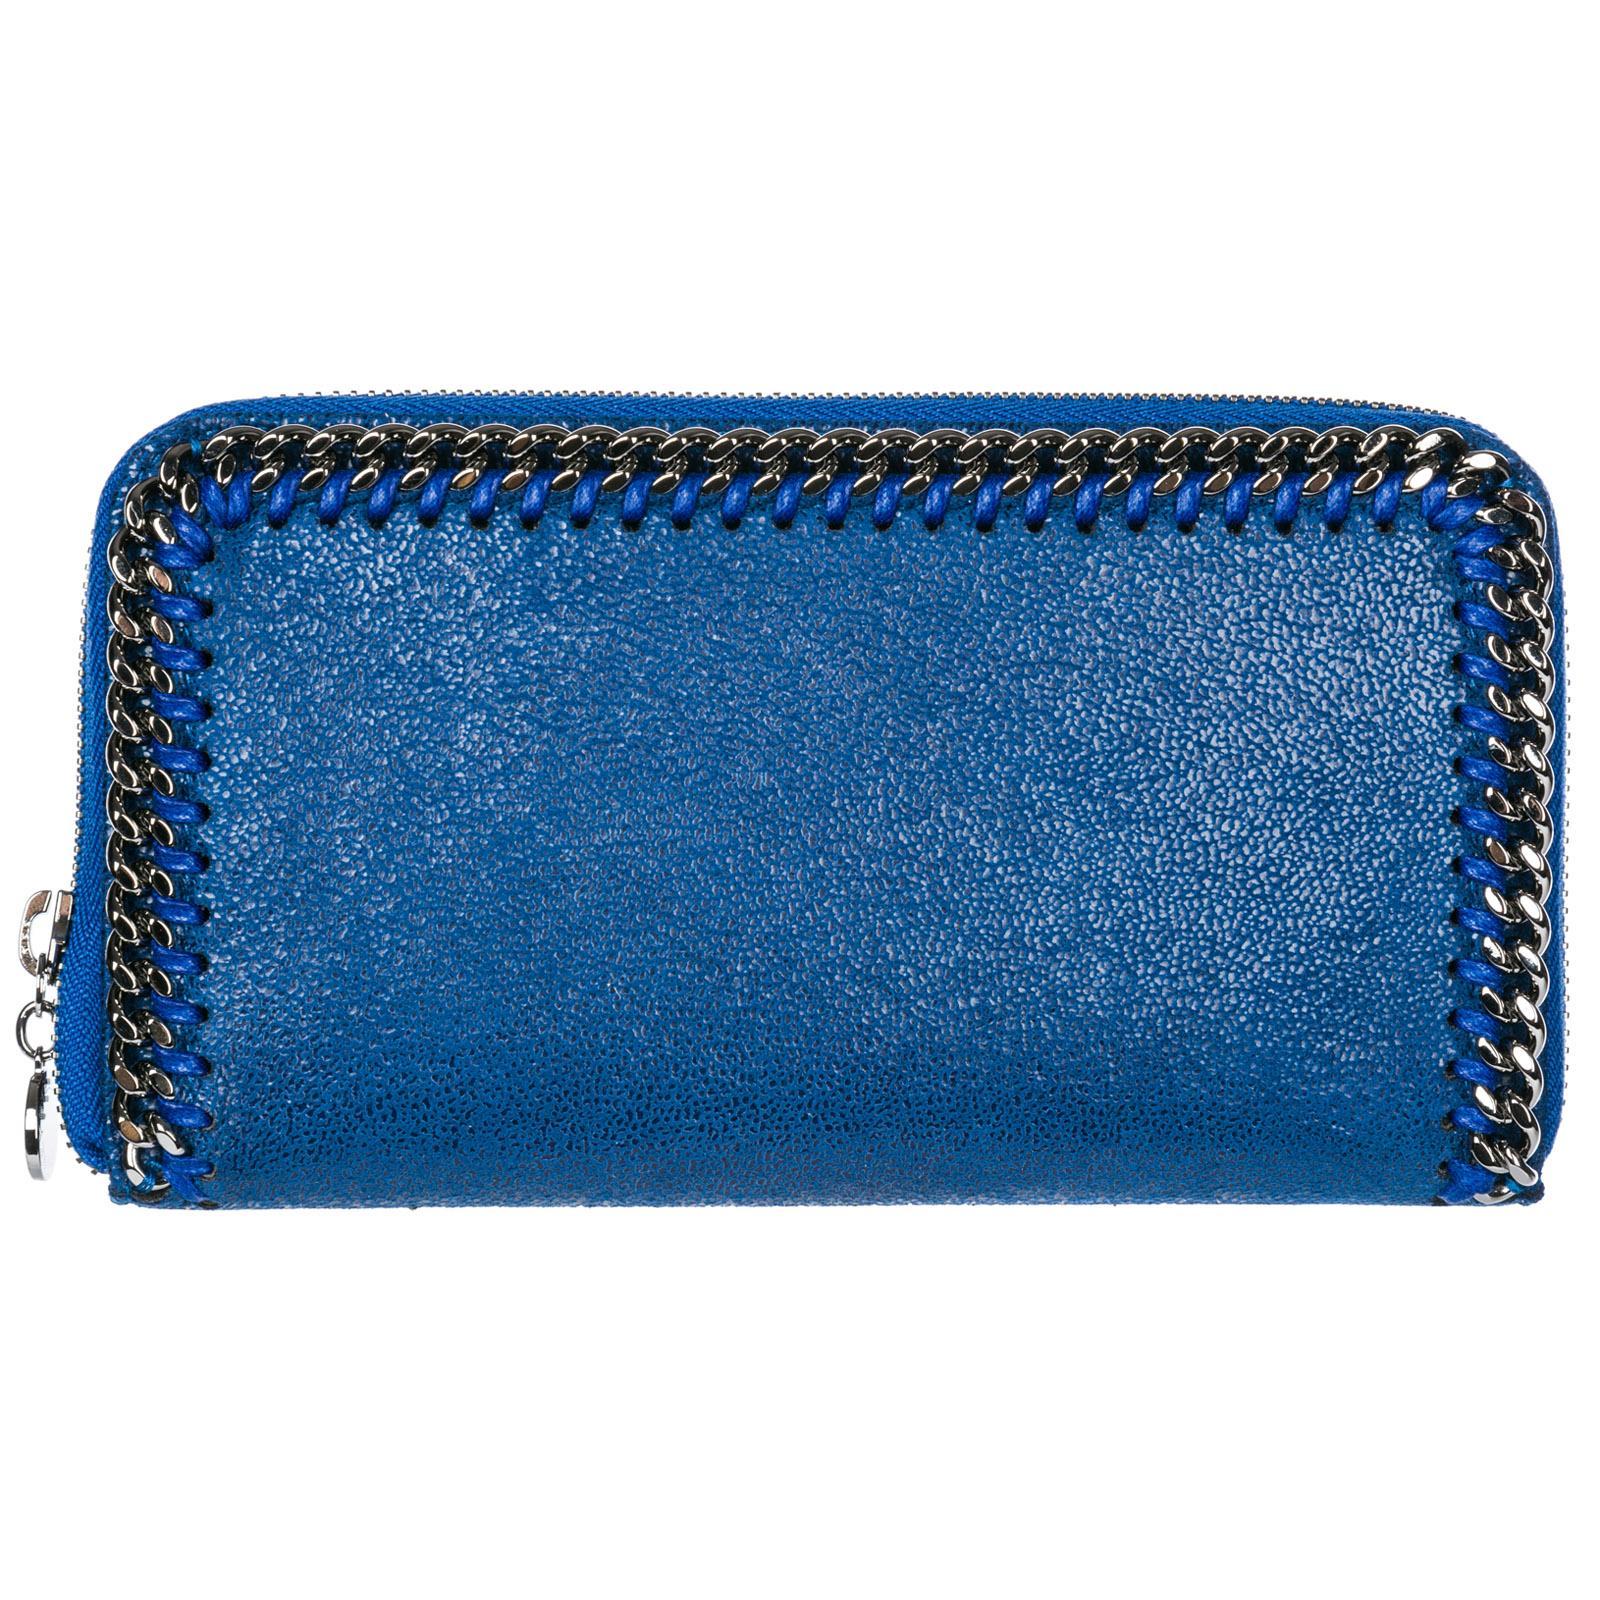 Stella Mccartney Women's Wallet Coin Case Holder Purse Card Bifold  Continental Falabella In Blue